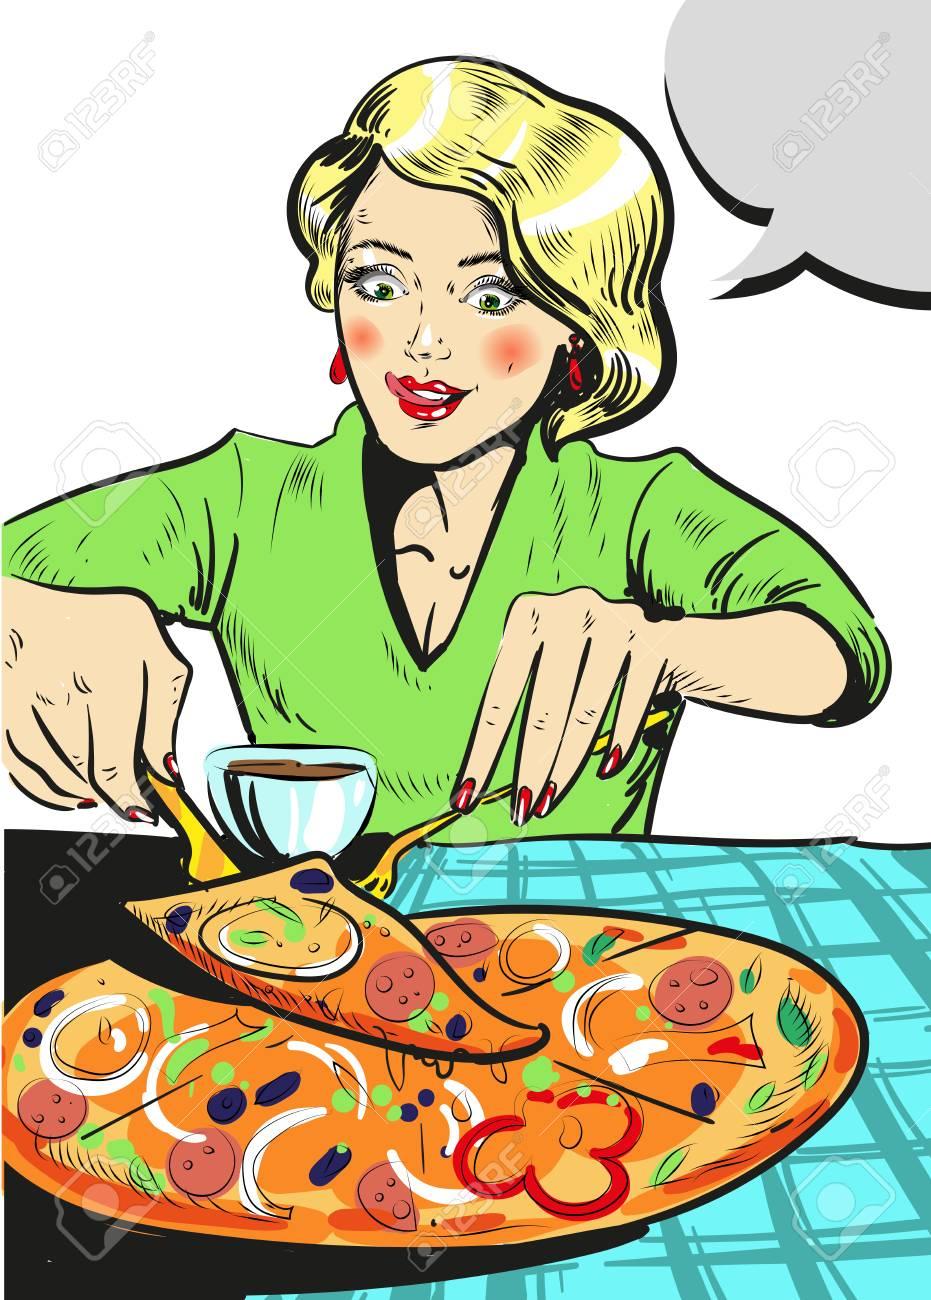 Woman eating pizza comic illustration - 74477013